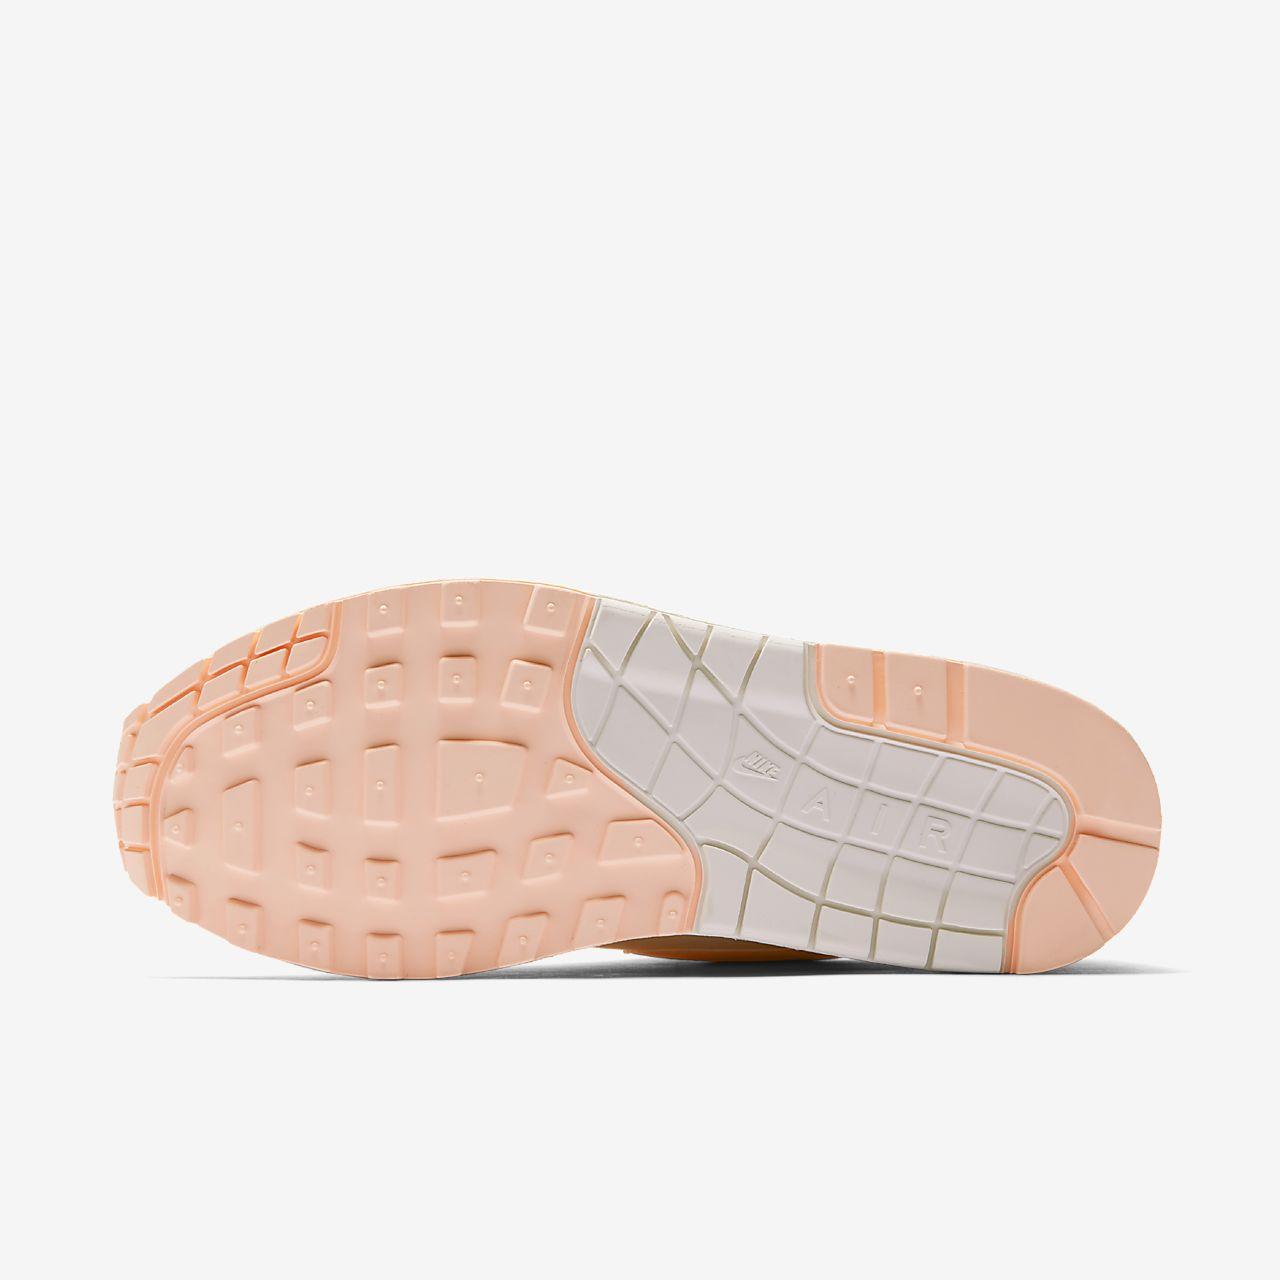 buy online e5ecb 2f2bb Low Resolution Nike Air Max 1 Womens Shoe Nike Air Max 1 Womens Shoe